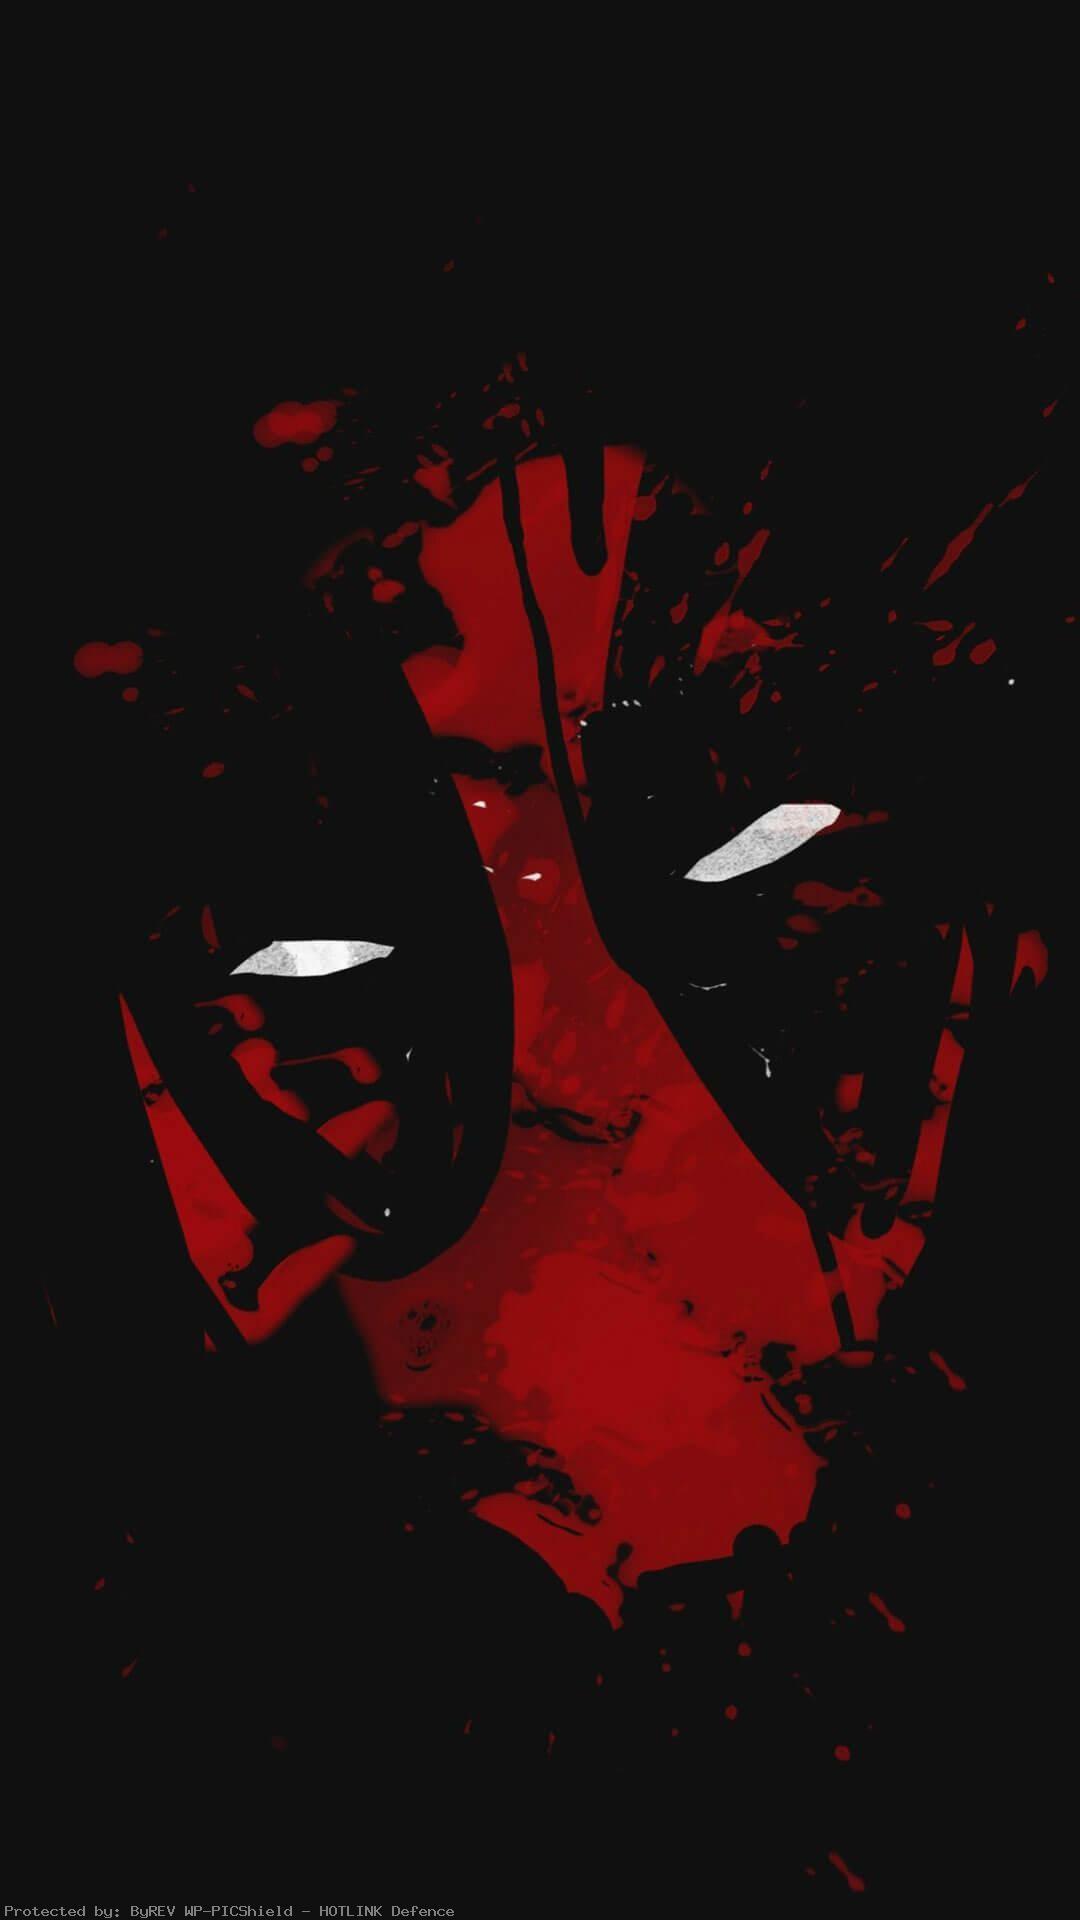 Deadpool Hd Wallpaper Iphone 3d Deadpool Logo Wallpaper 76 Images